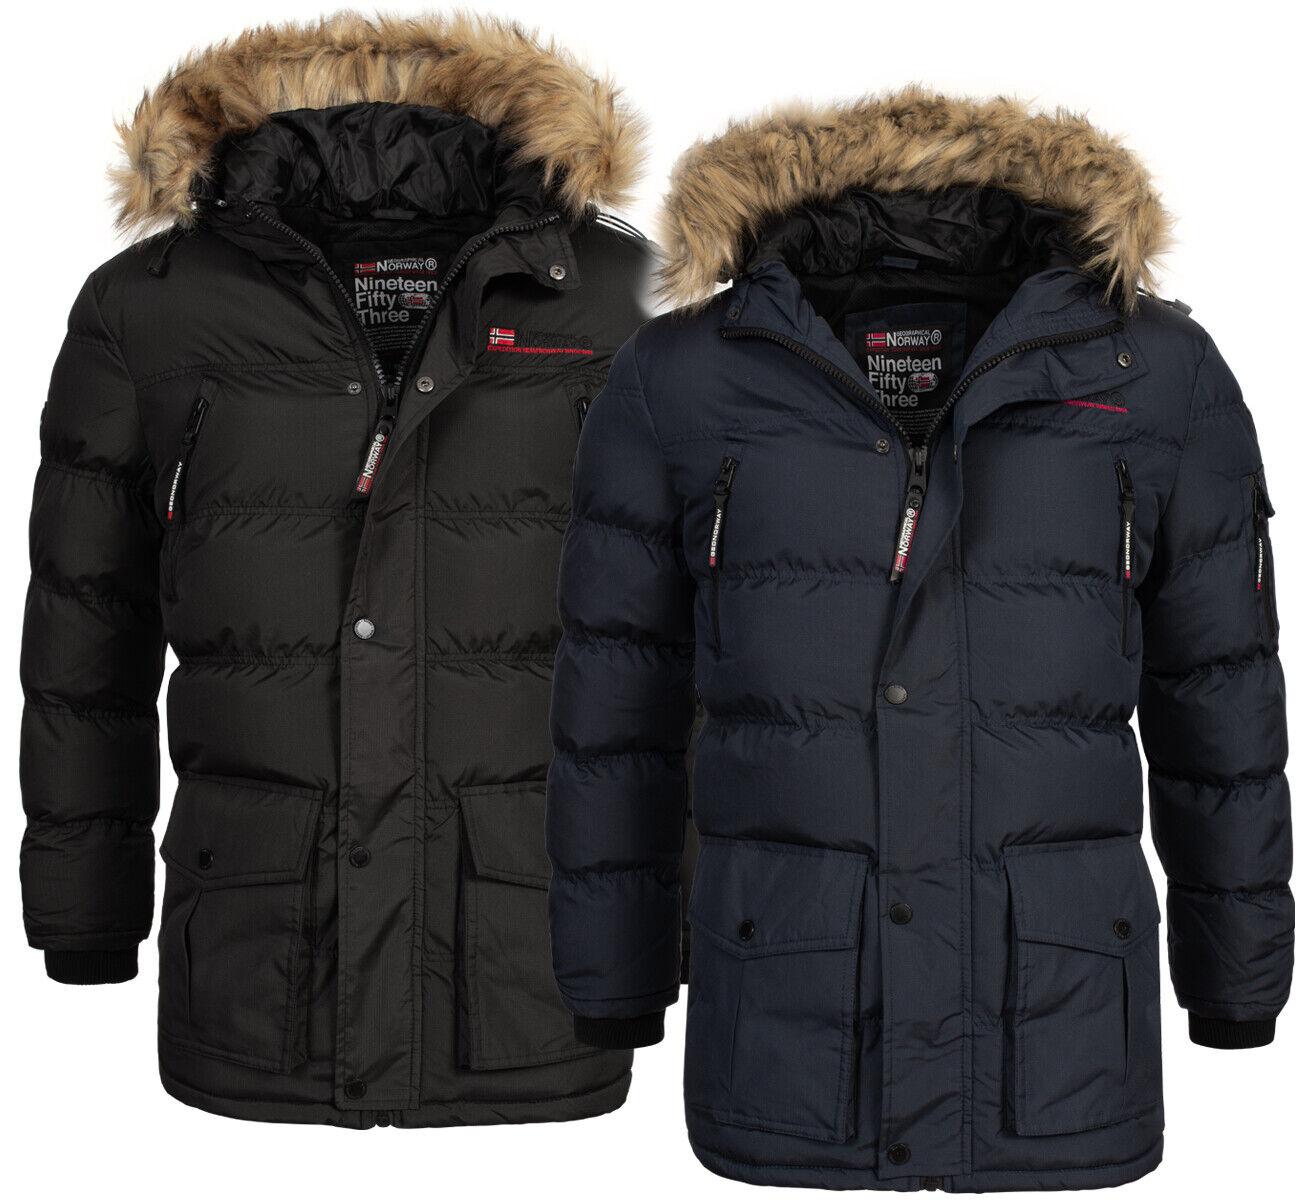 Geographical Norway warme Herren Winter Jacke FVSA Outdoor Parka Mantel Kapuze